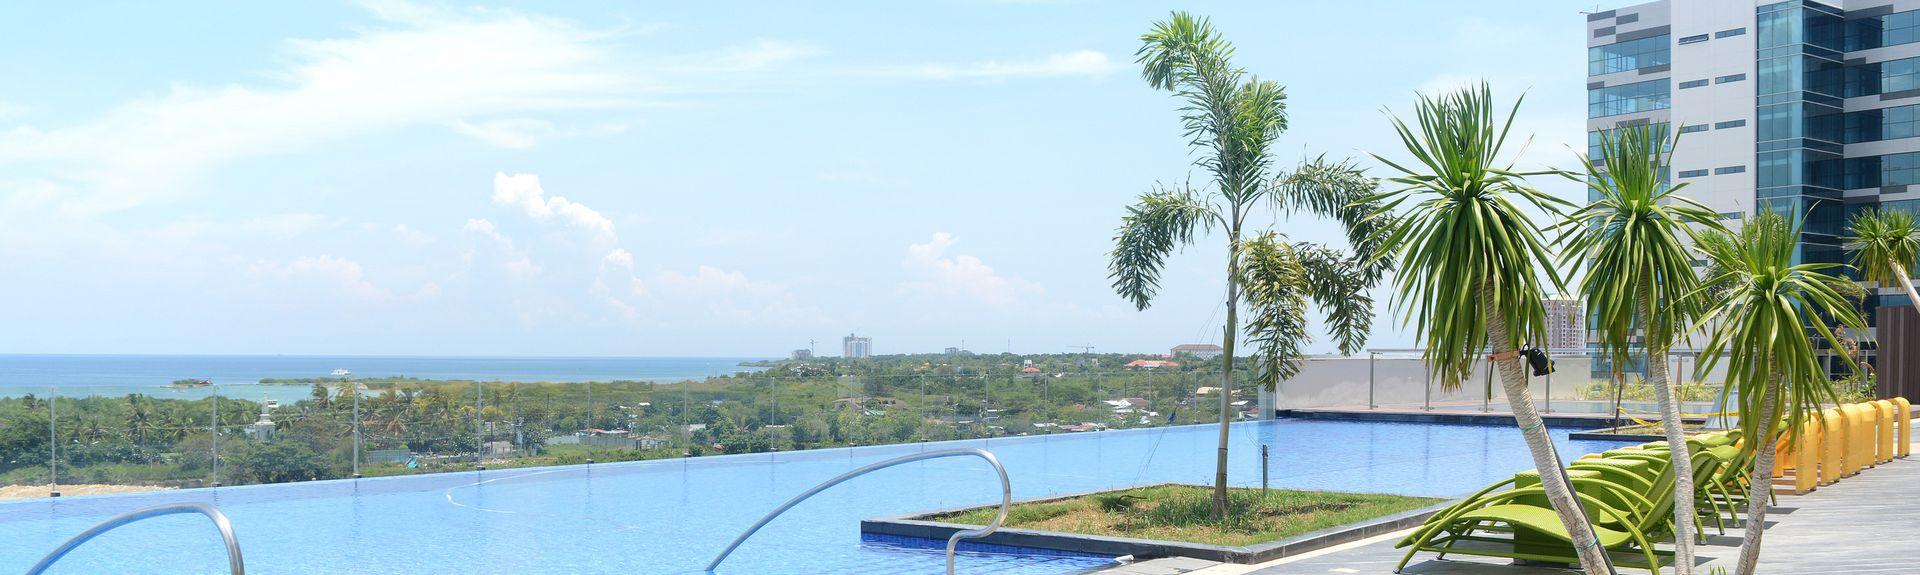 Cebu Doctor's University Hospital, Cebu, Central Visayas, Philippinen